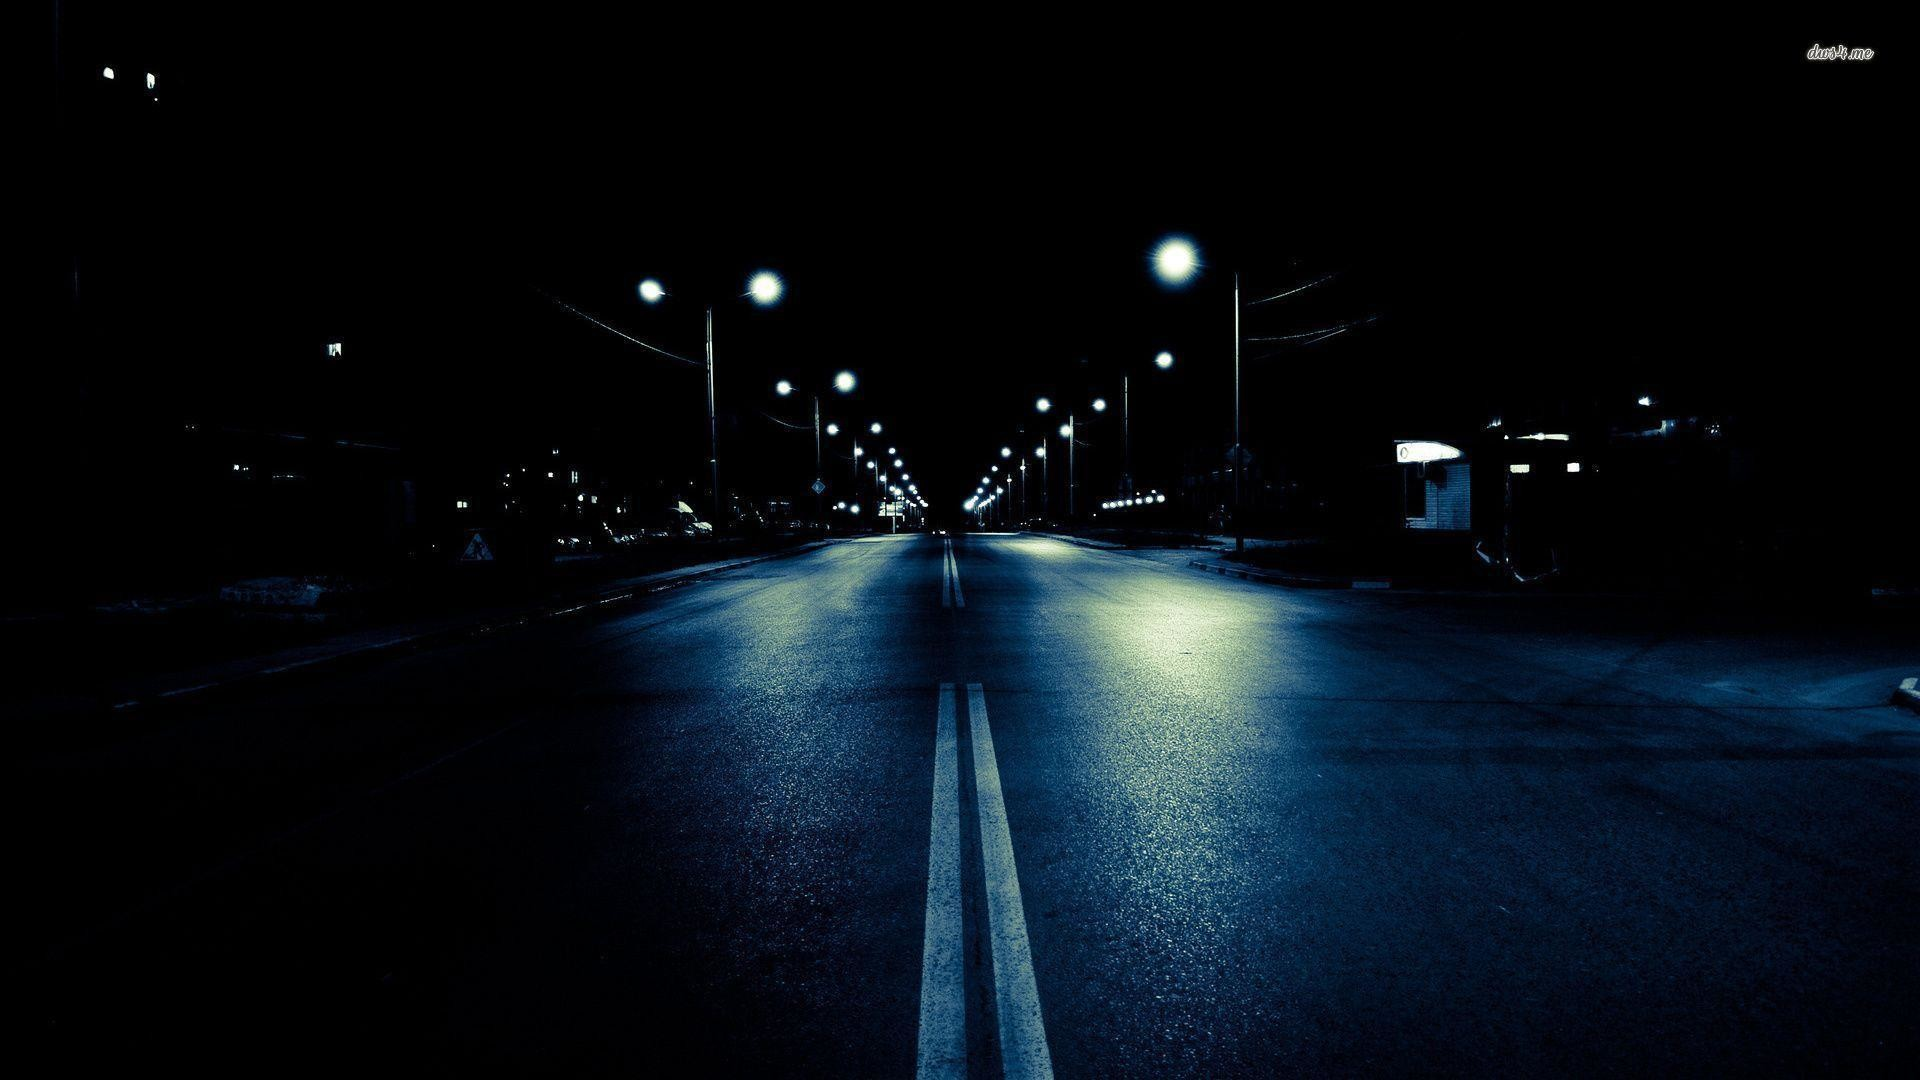 Street Wallpaper HD Night City – WallpaperSafari